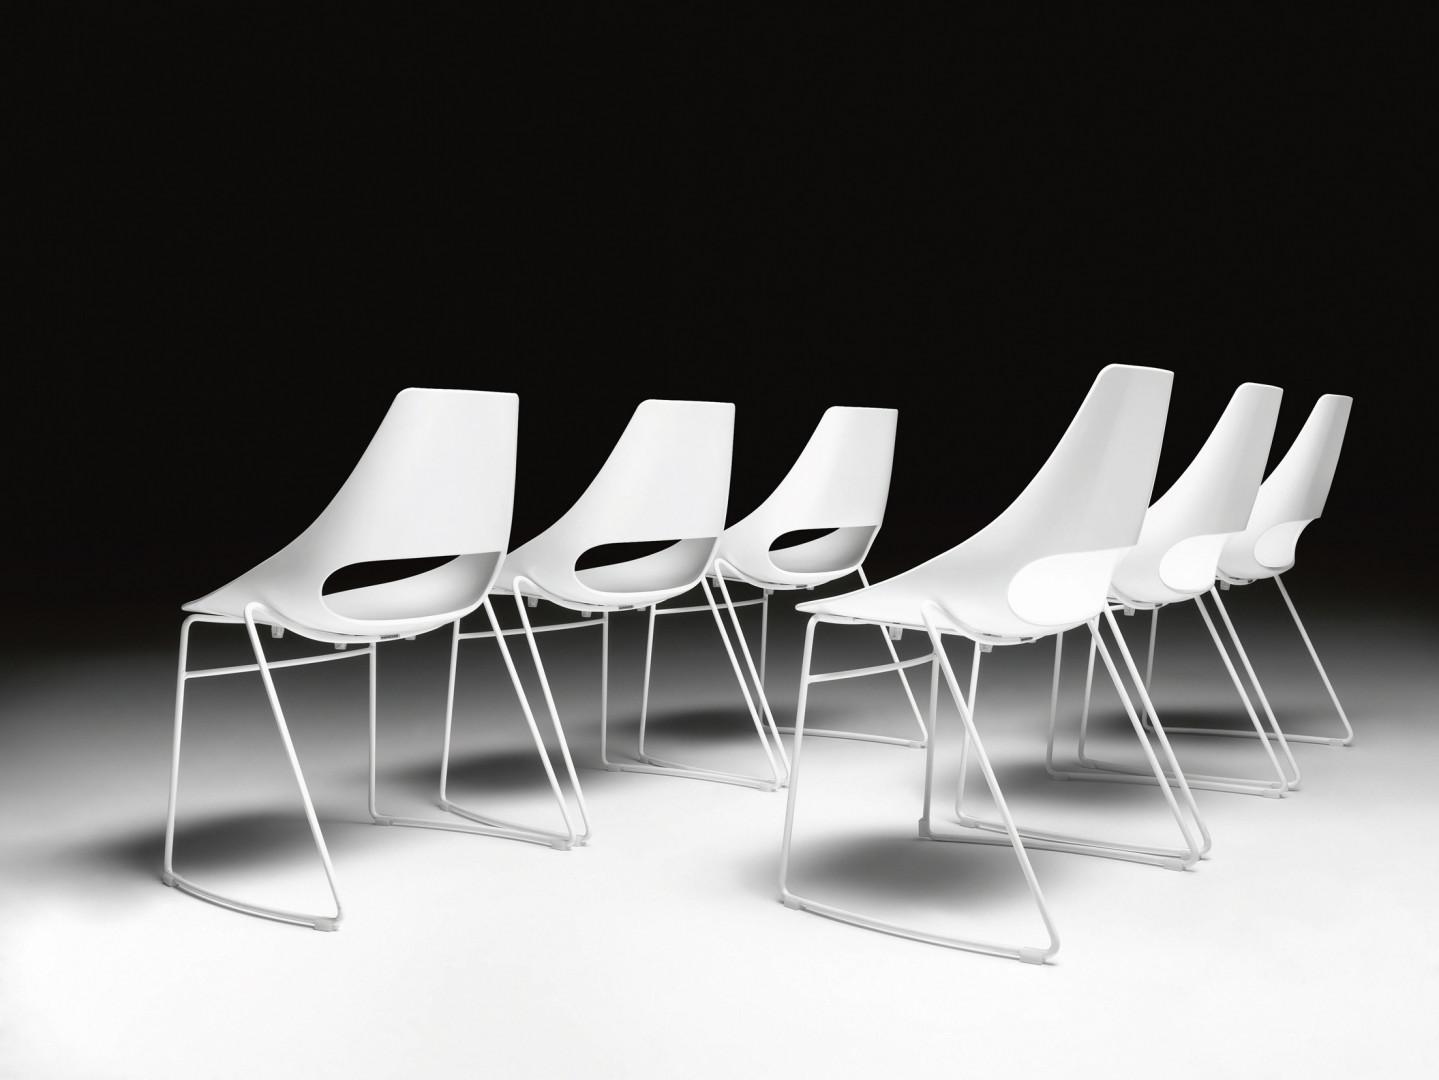 Krzesła Echo marki Metalmobil. Fot. Dekorian